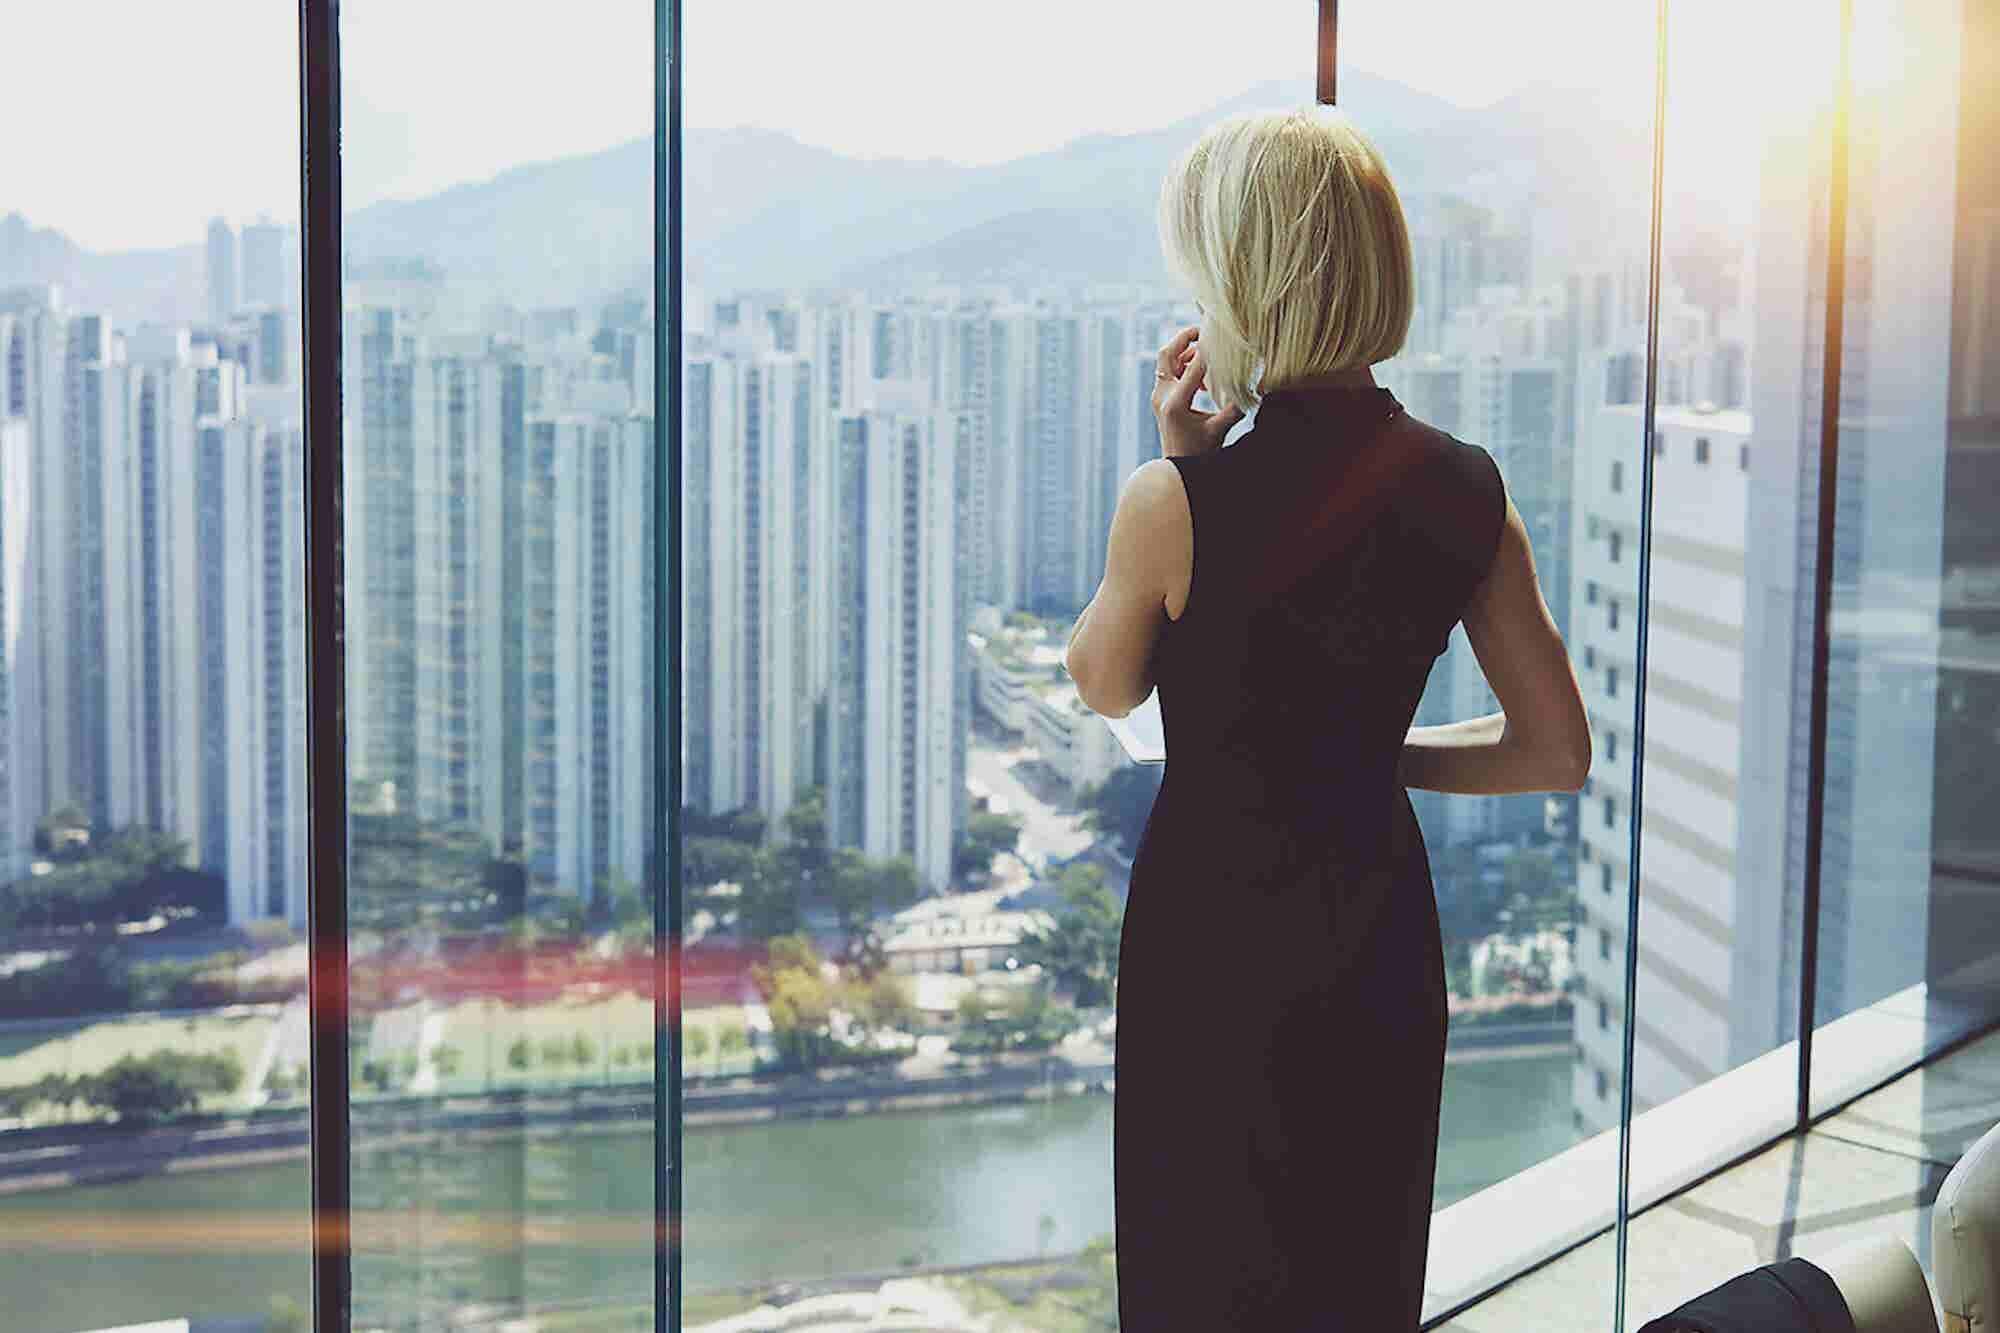 #Shepreneurs: 4 Advantages Women Leaders Have Over Men